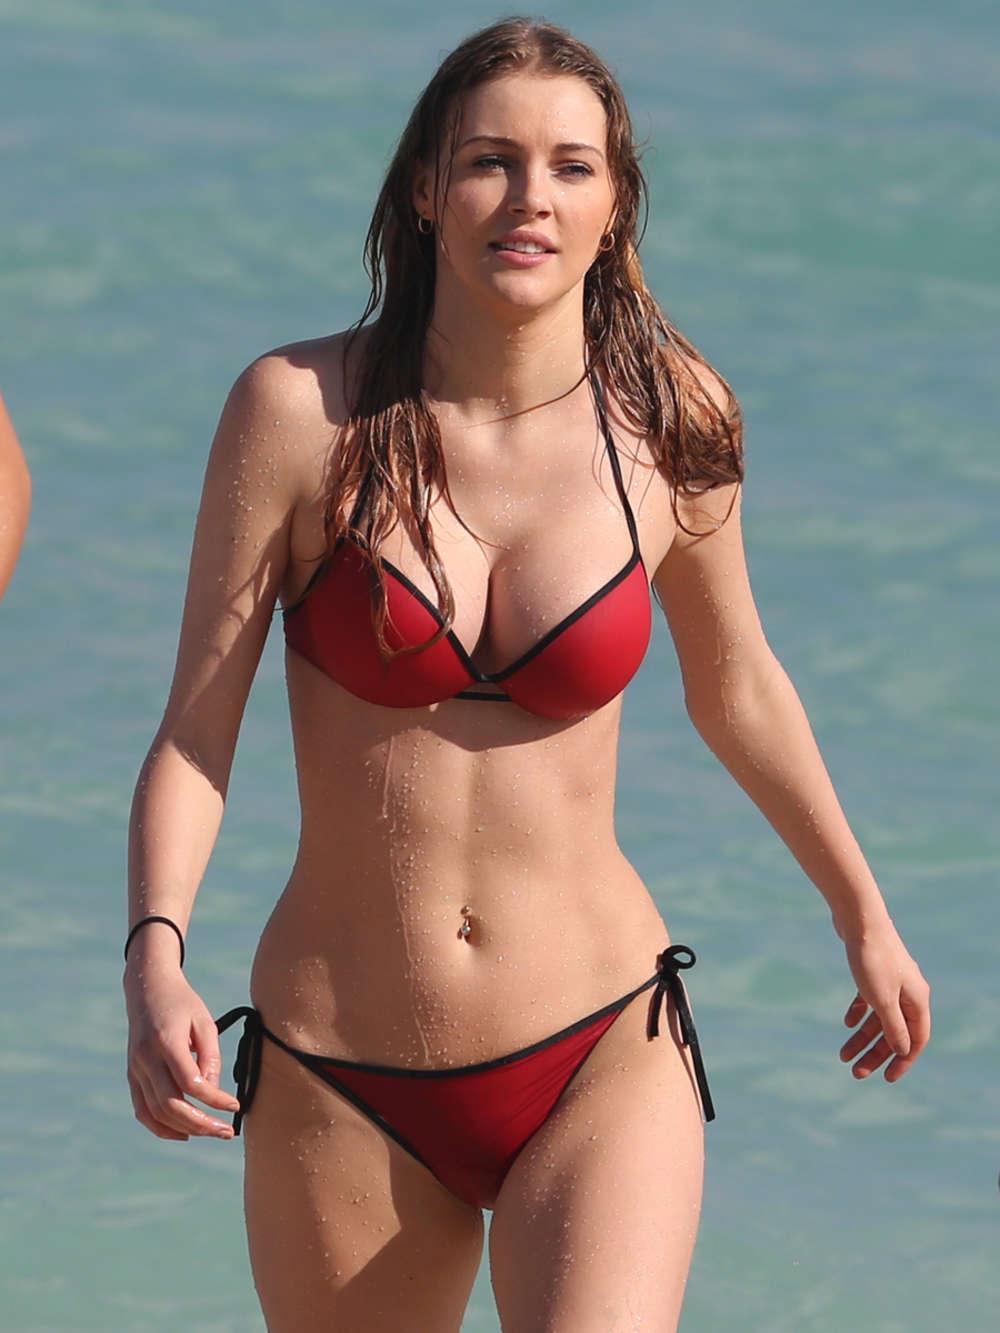 Kate hudson has so much fun in hawaii, she nearly loses her bikini bottom